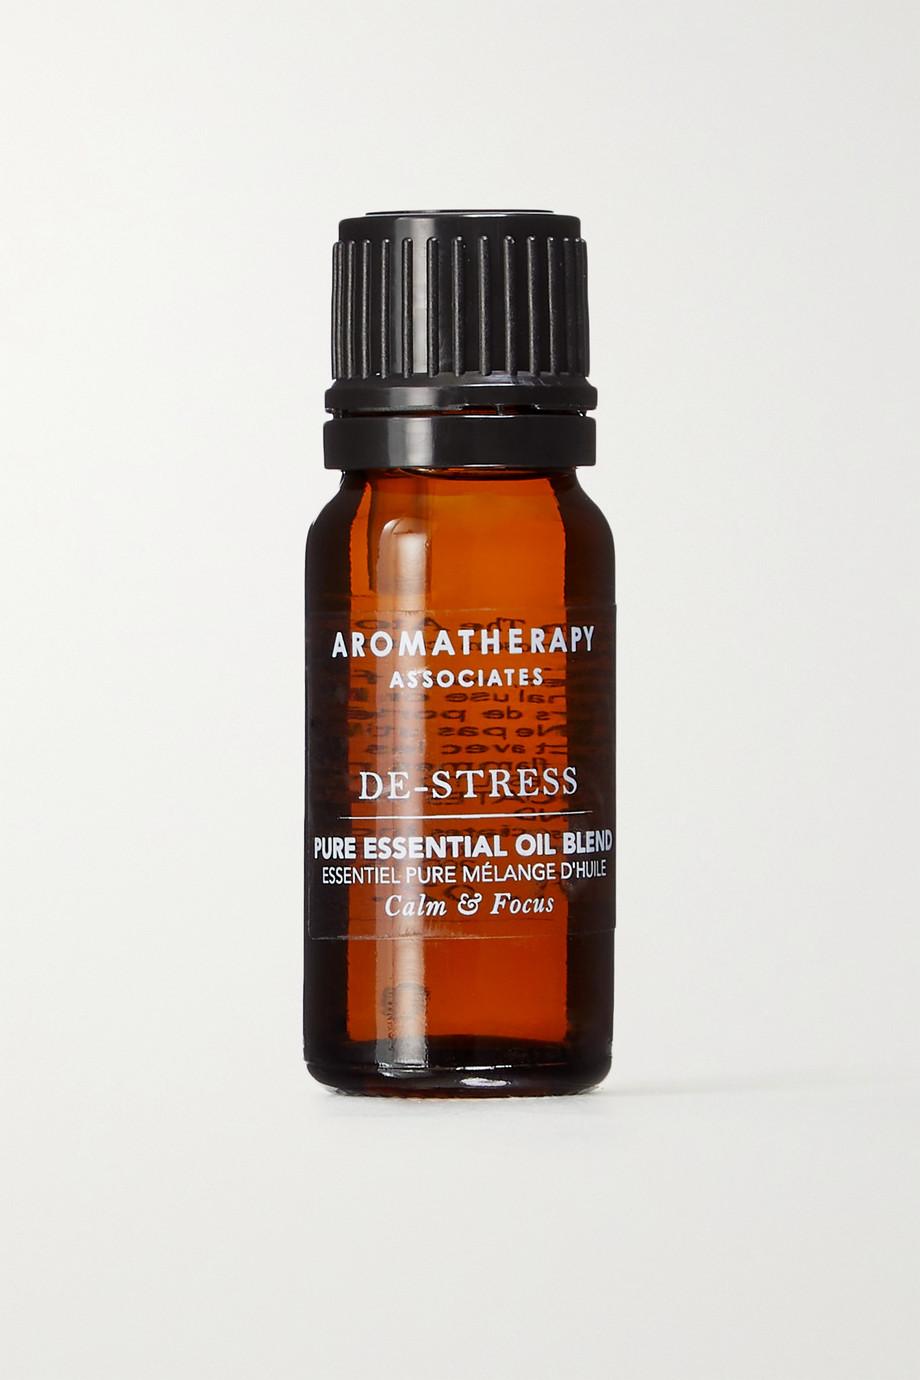 Aromatherapy Associates De-Stress Pure Essential Oil Blend, 10ml